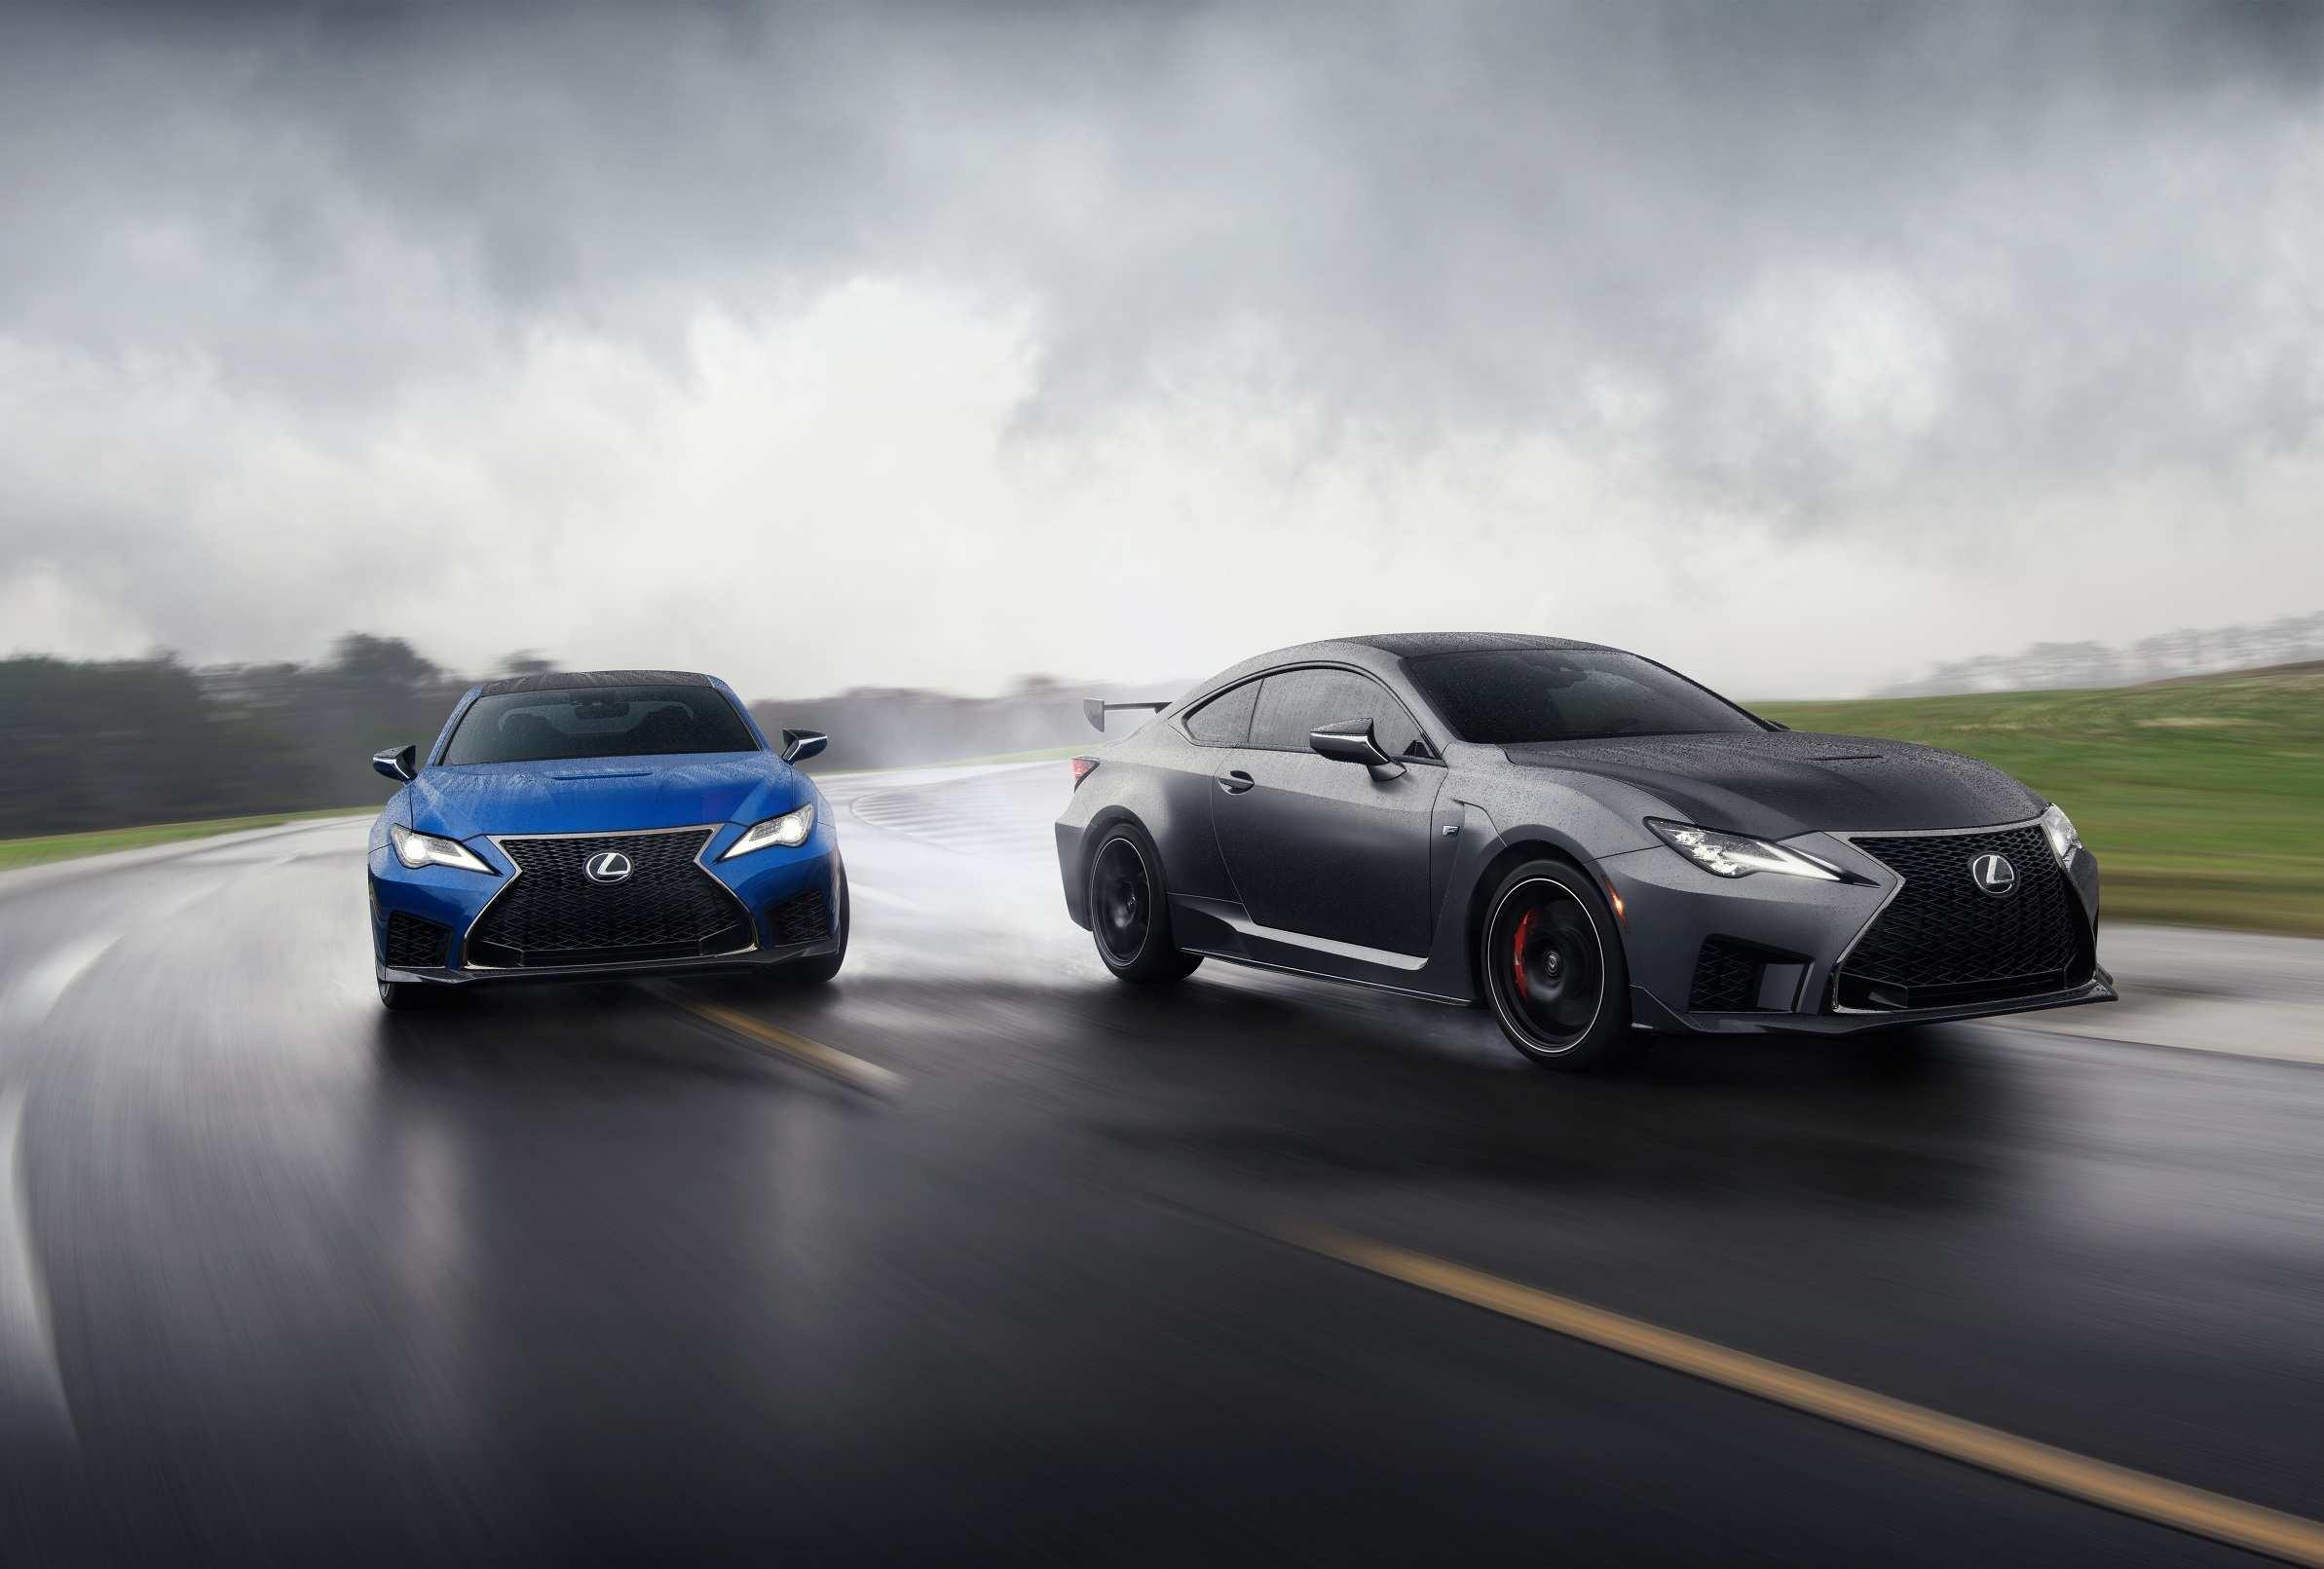 16 Concept of Lexus Design Award 2020 Pricing with Lexus Design Award 2020